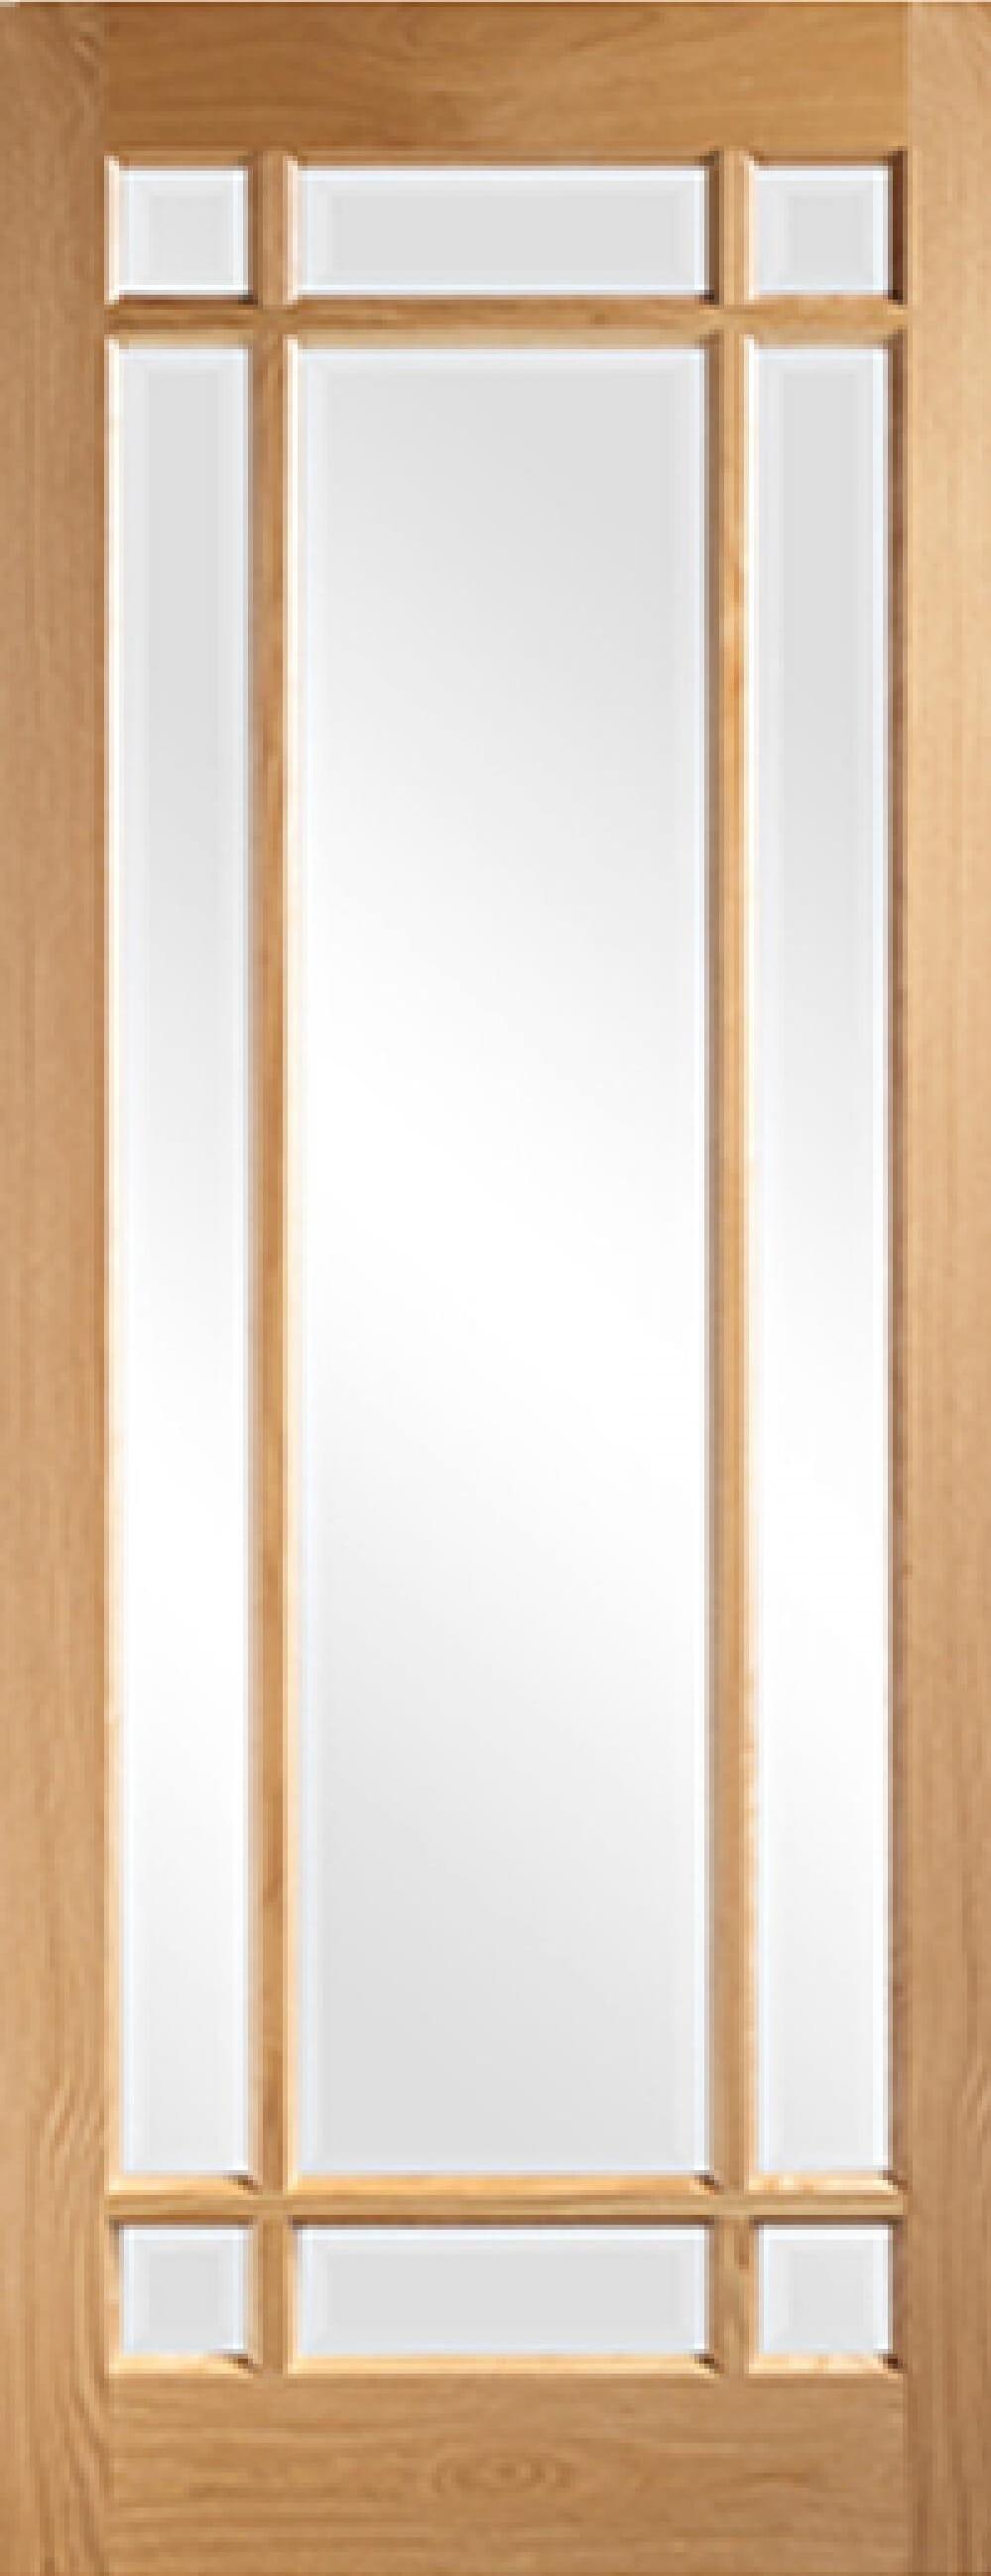 Kerry Glazed Oak Image